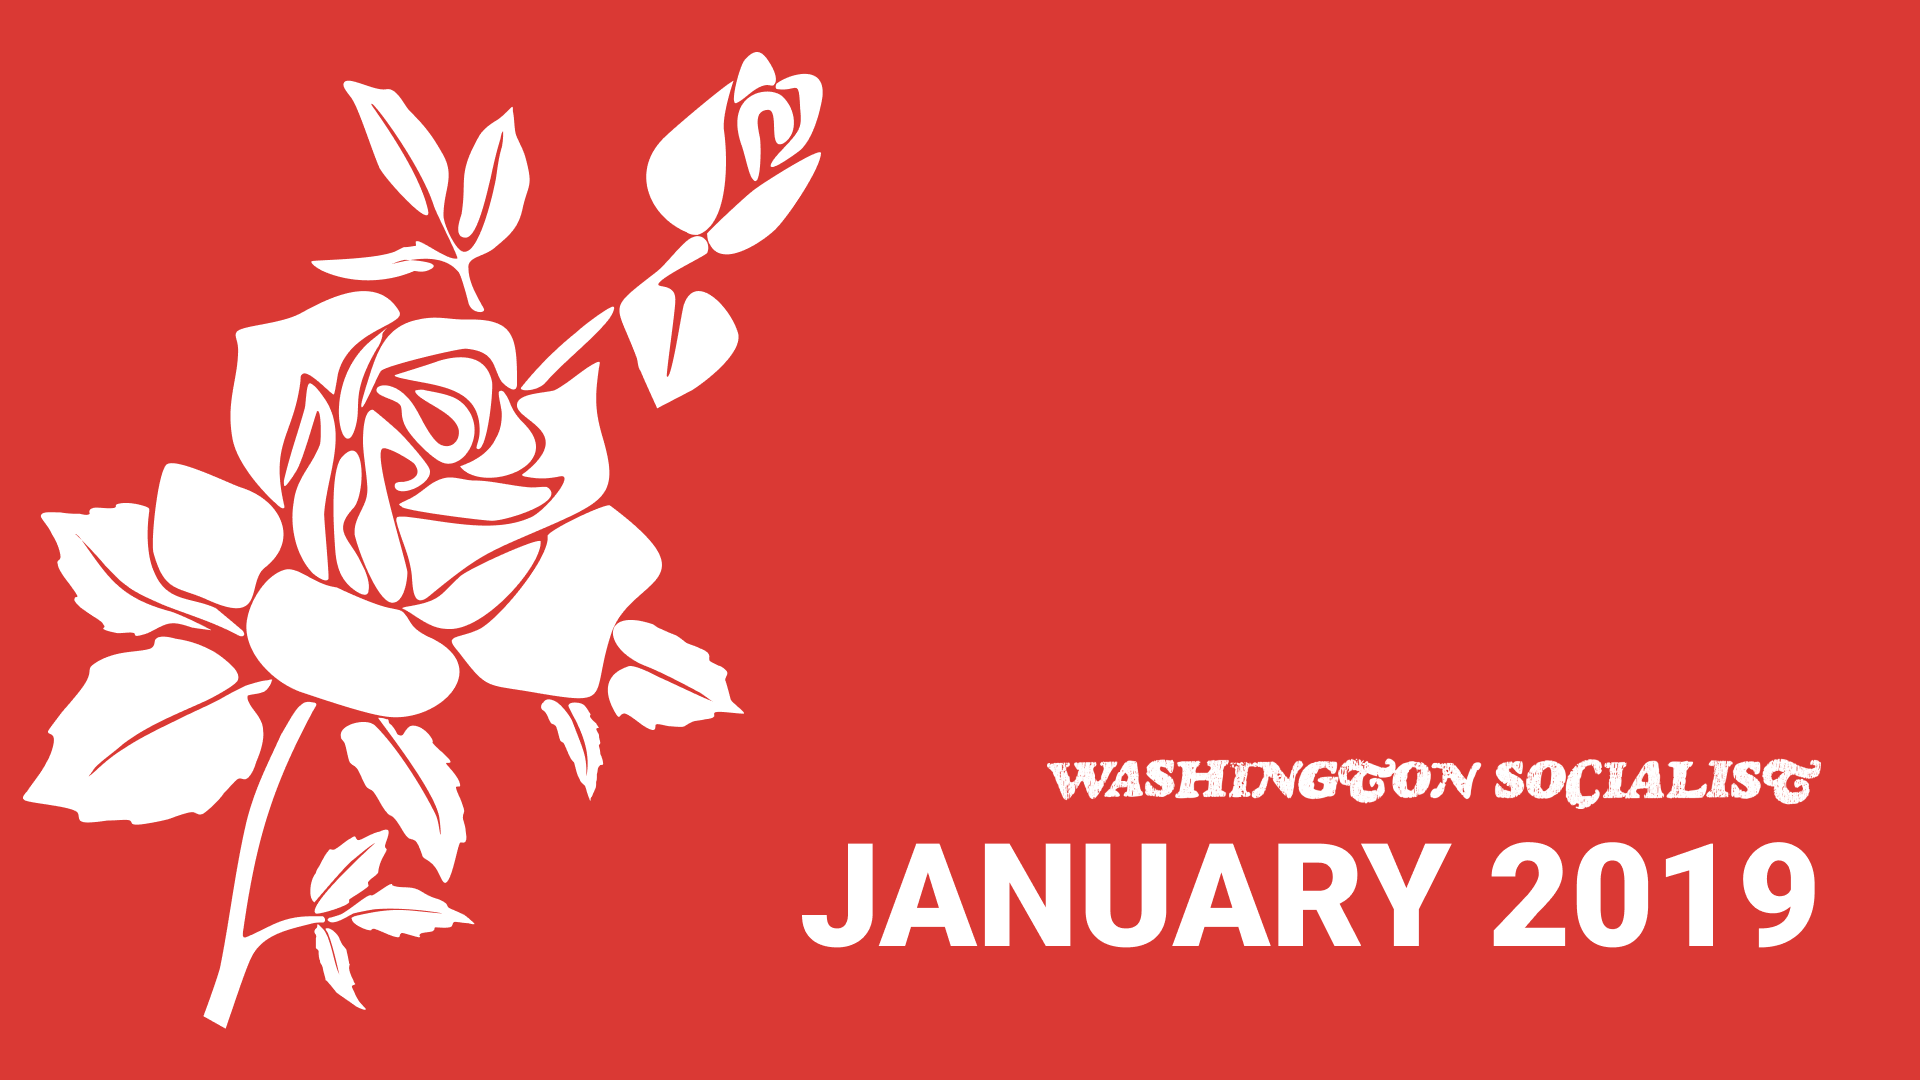 Washington Socialist Cover, January 2019